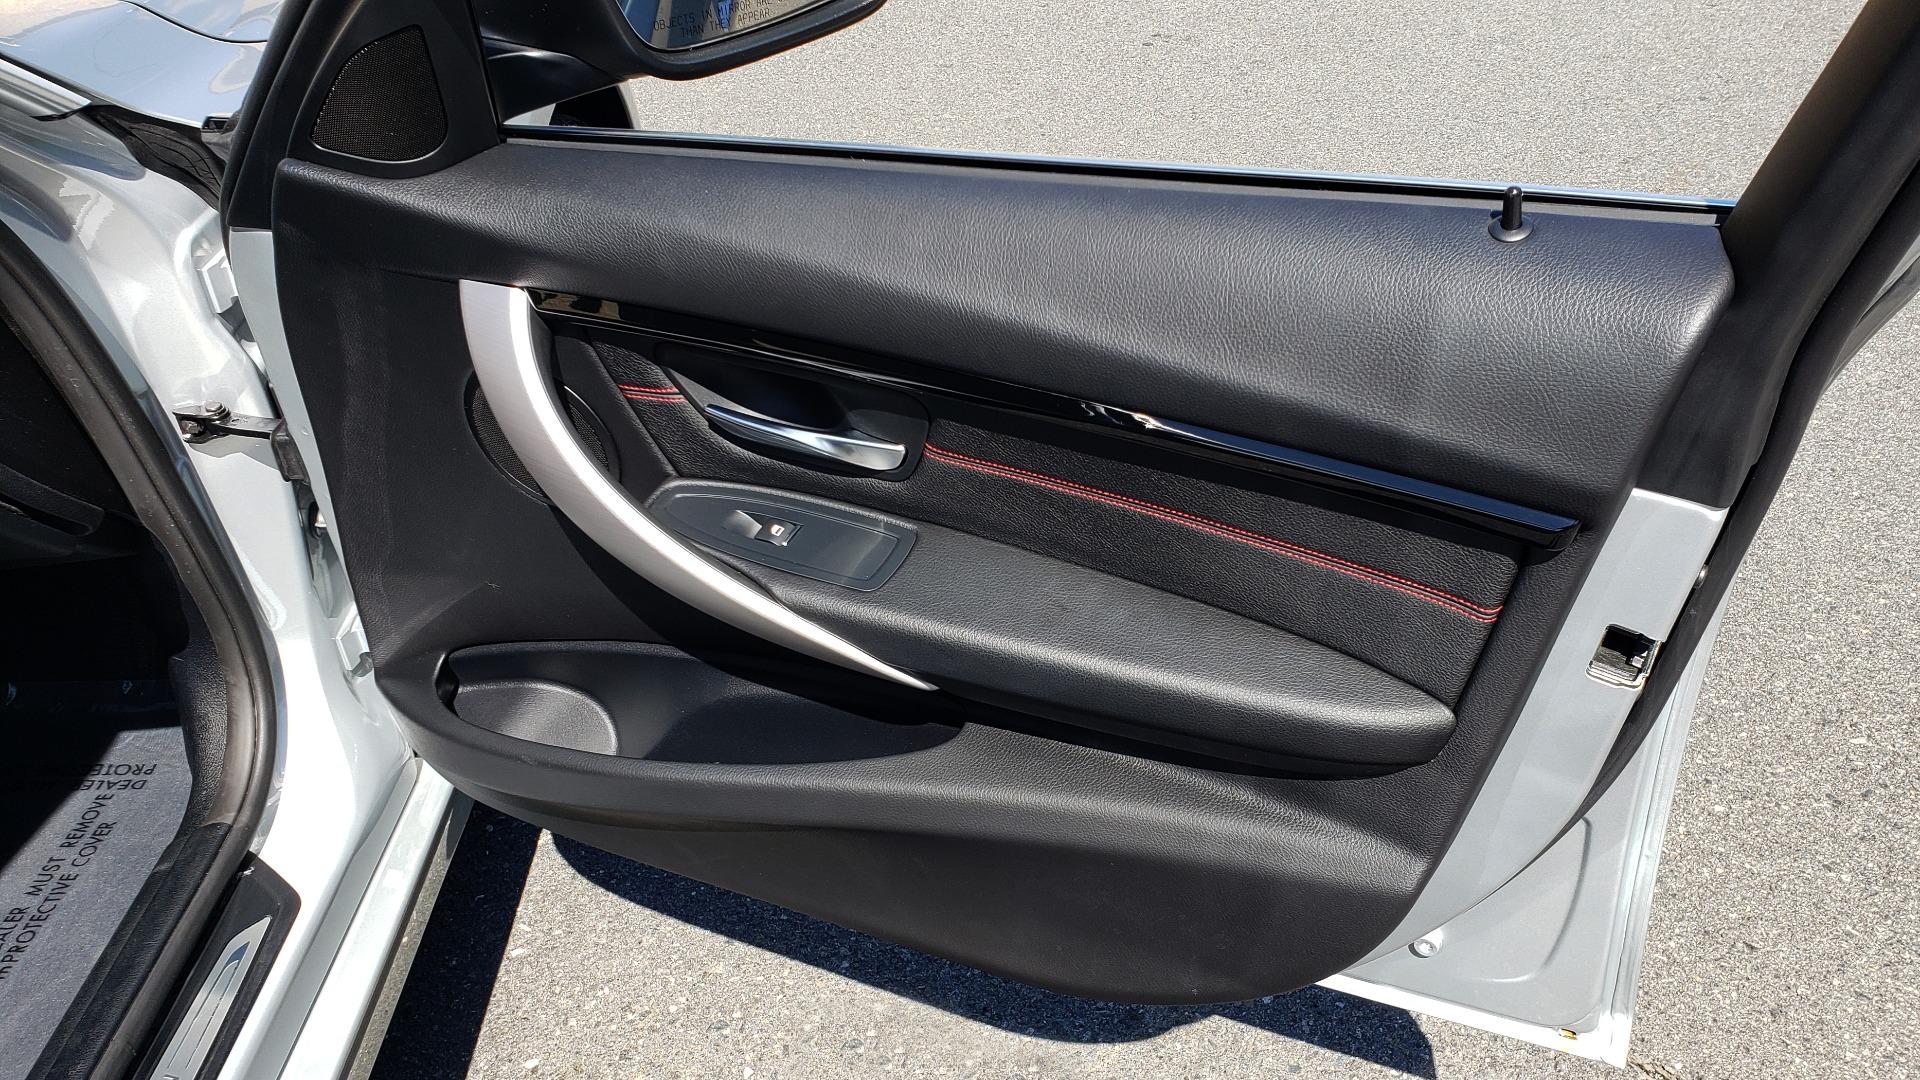 Used 2017 BMW 3 SERIES 330I SPORT SEDAN / DRVR ASST PKG / SUNROOF / REARVIEW for sale Sold at Formula Imports in Charlotte NC 28227 29